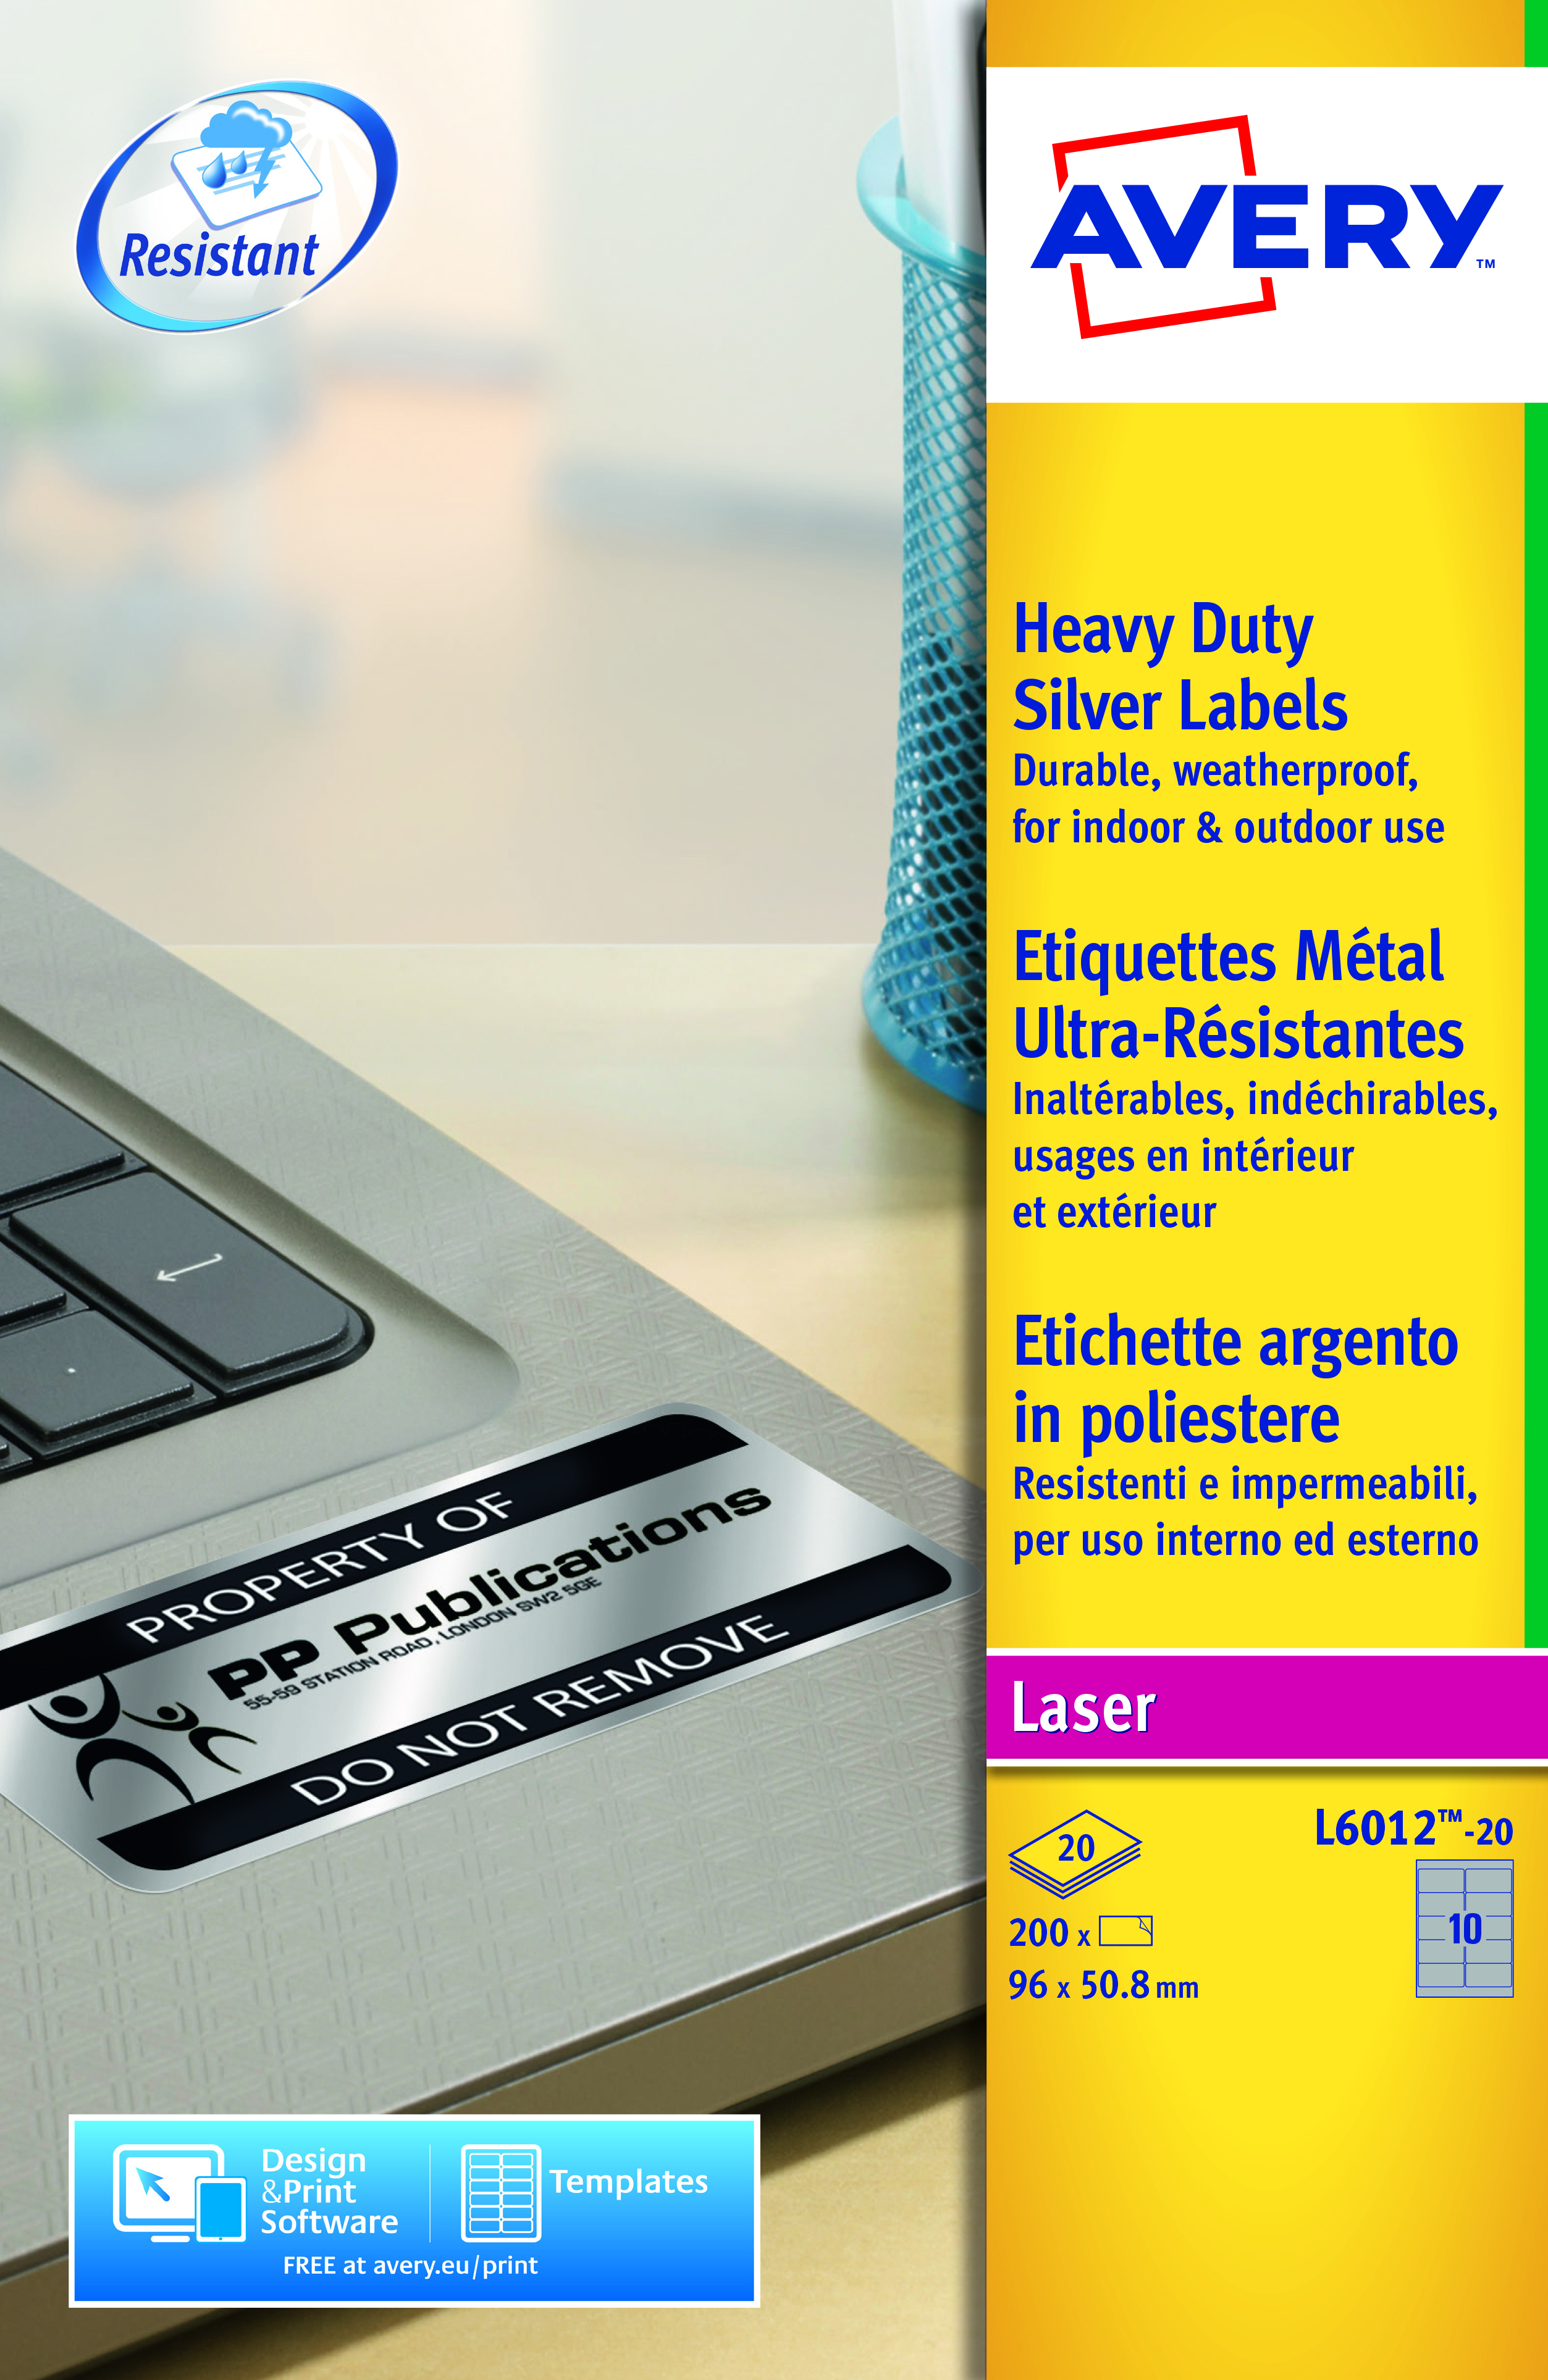 Avery HD Label 96x50.8mm SL PK200